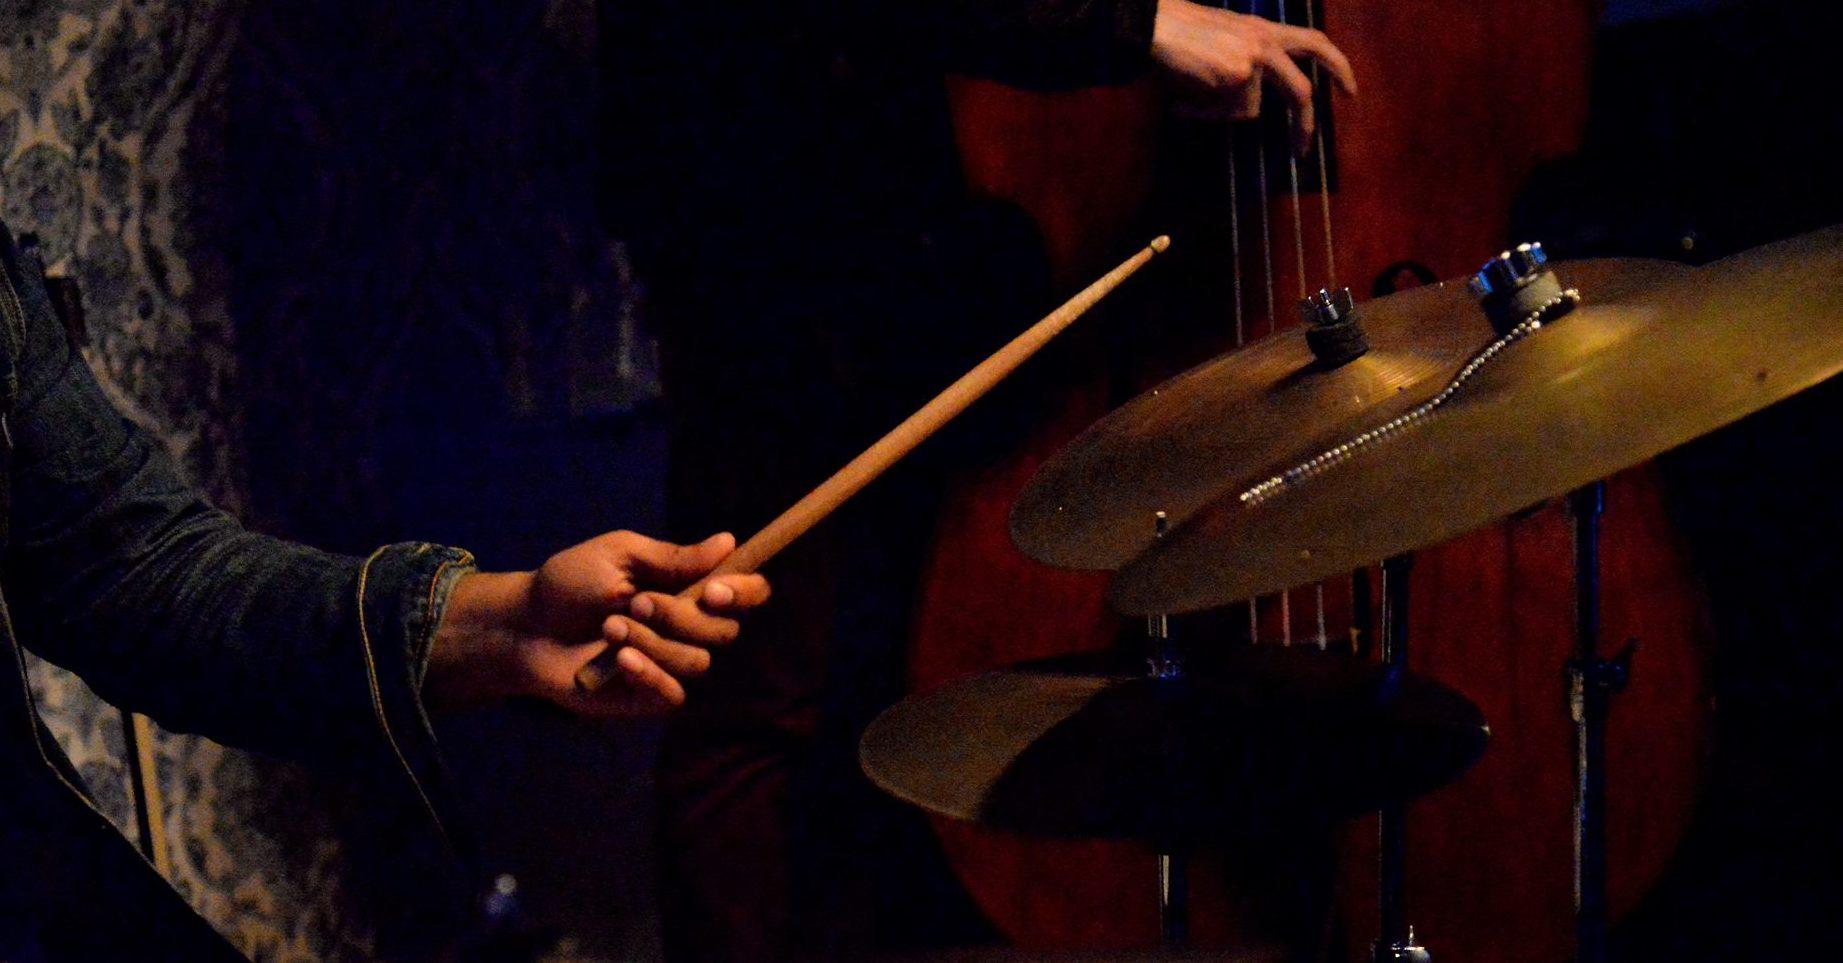 Jazz band featuring drummer holding drumsticks